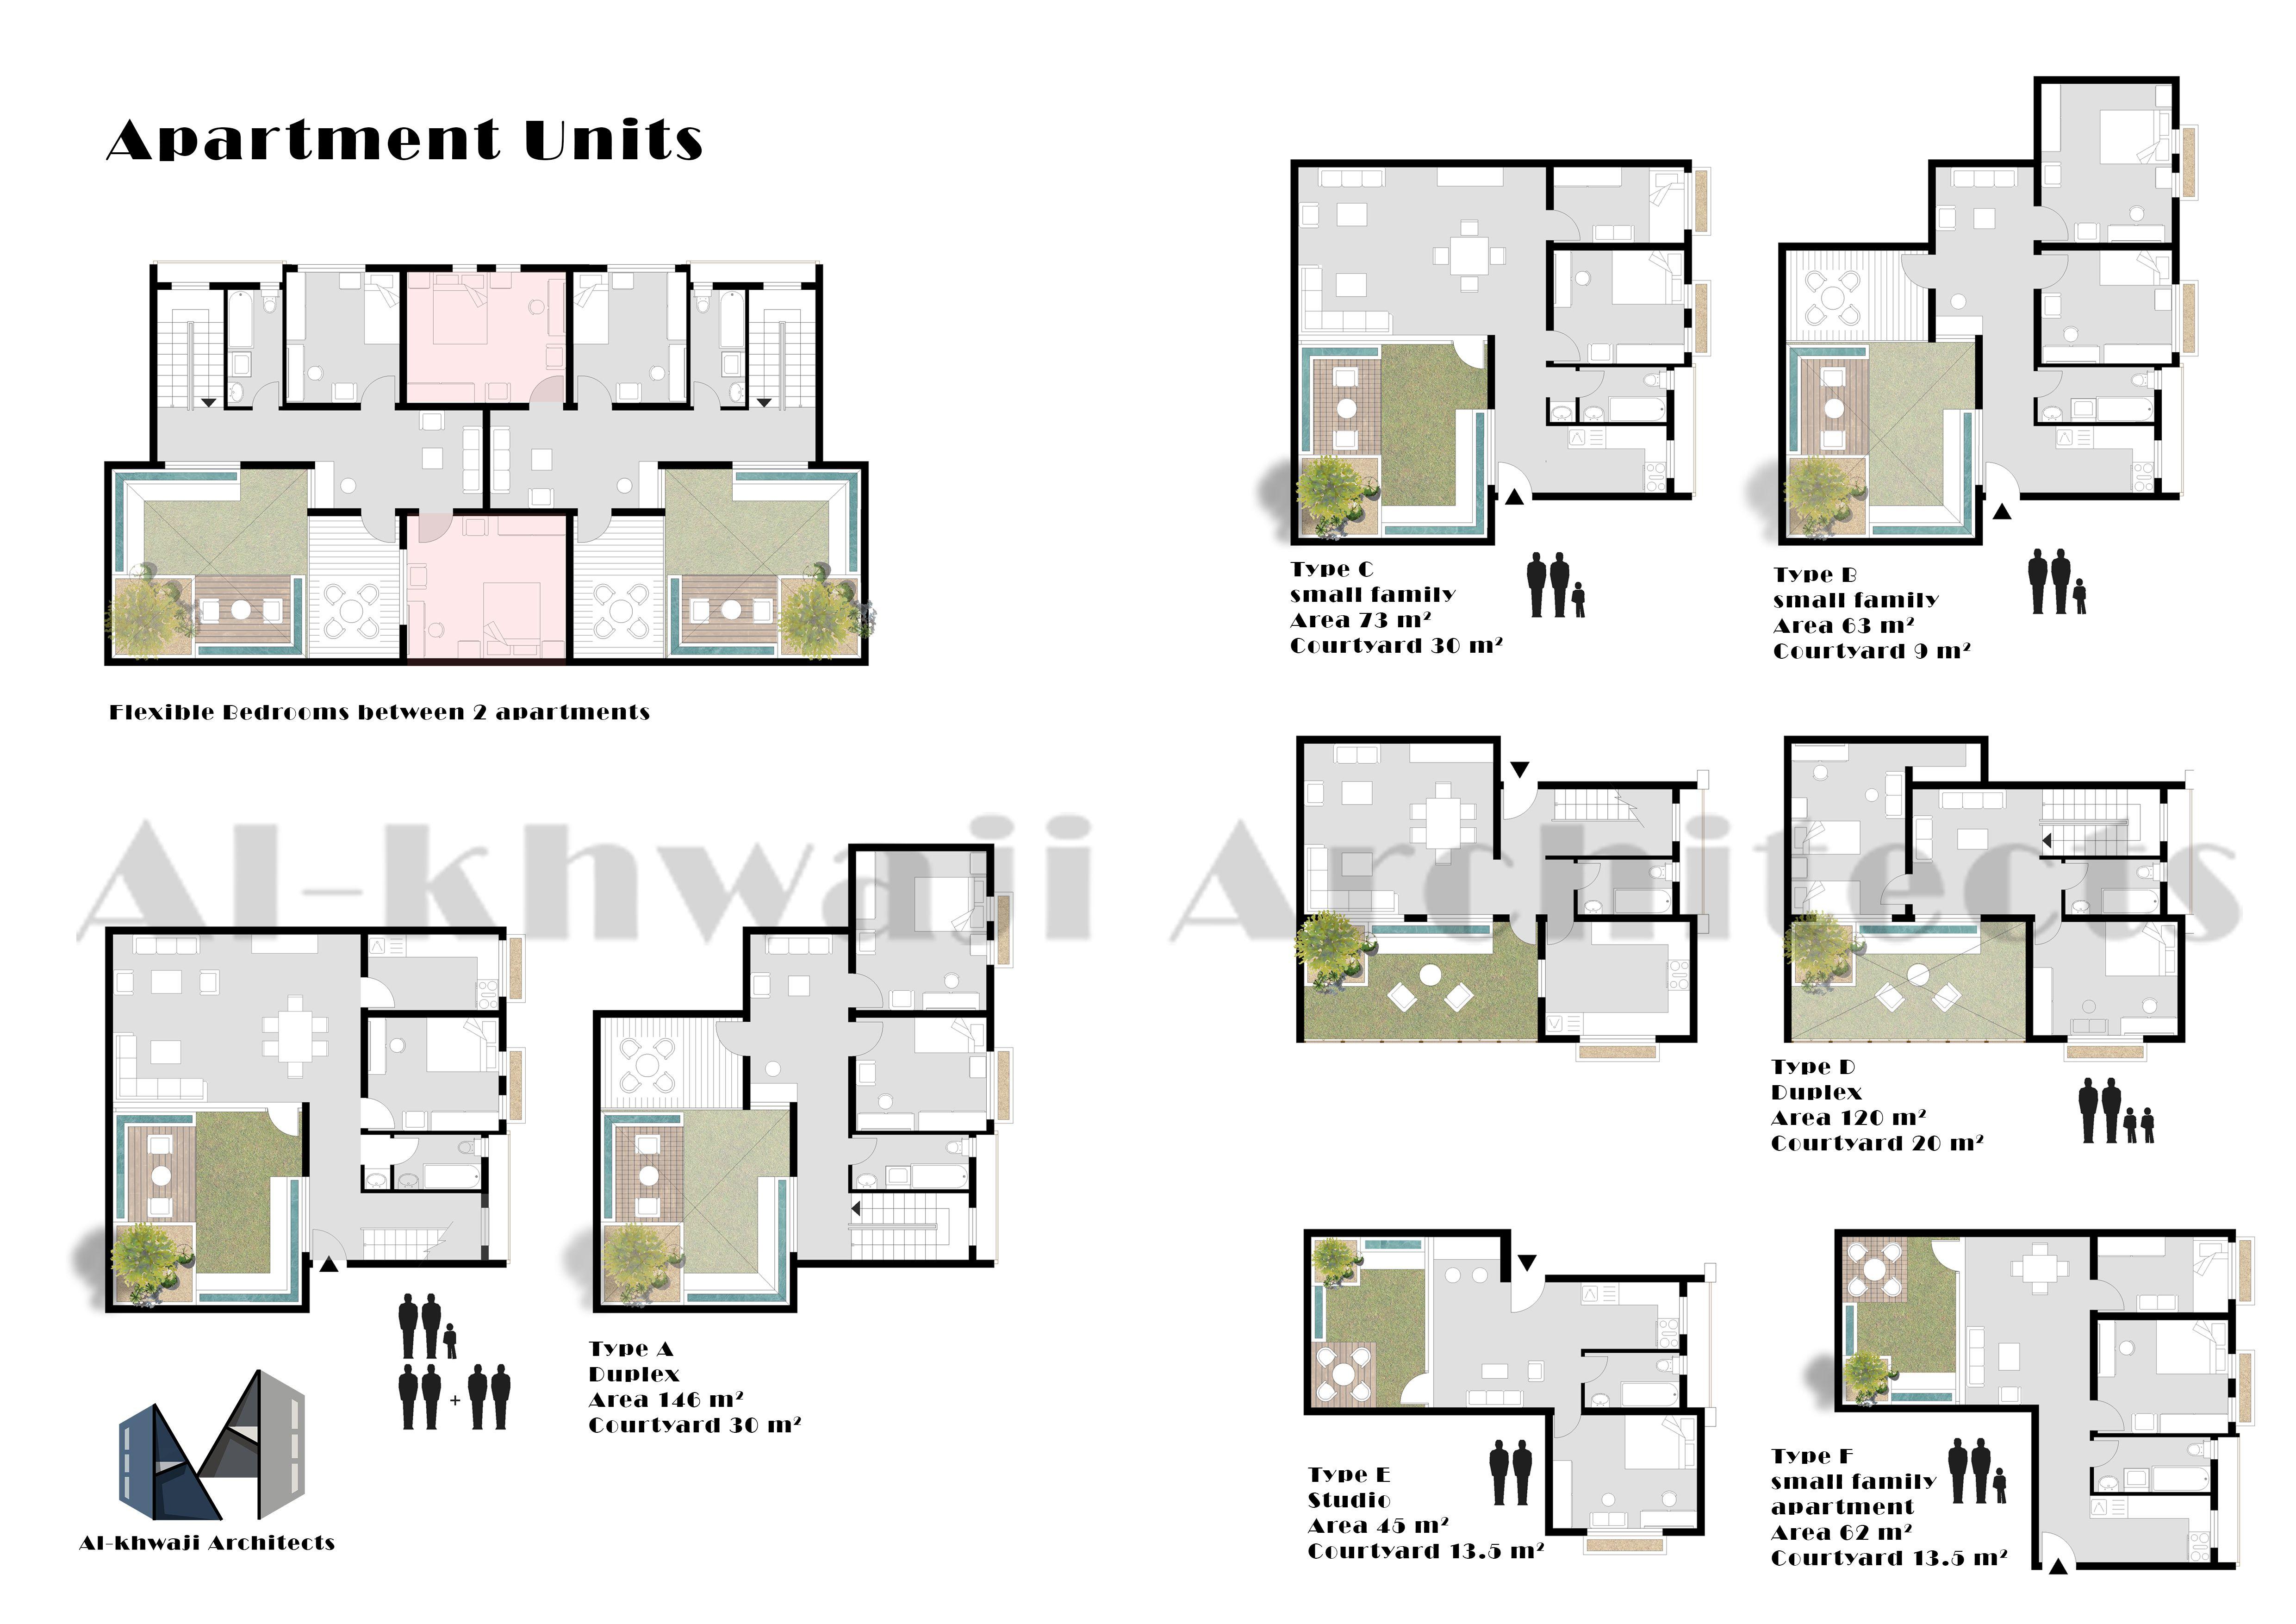 Apartment Units Floor Plan Courtyard House Floor Plans Rendered Floor Plan